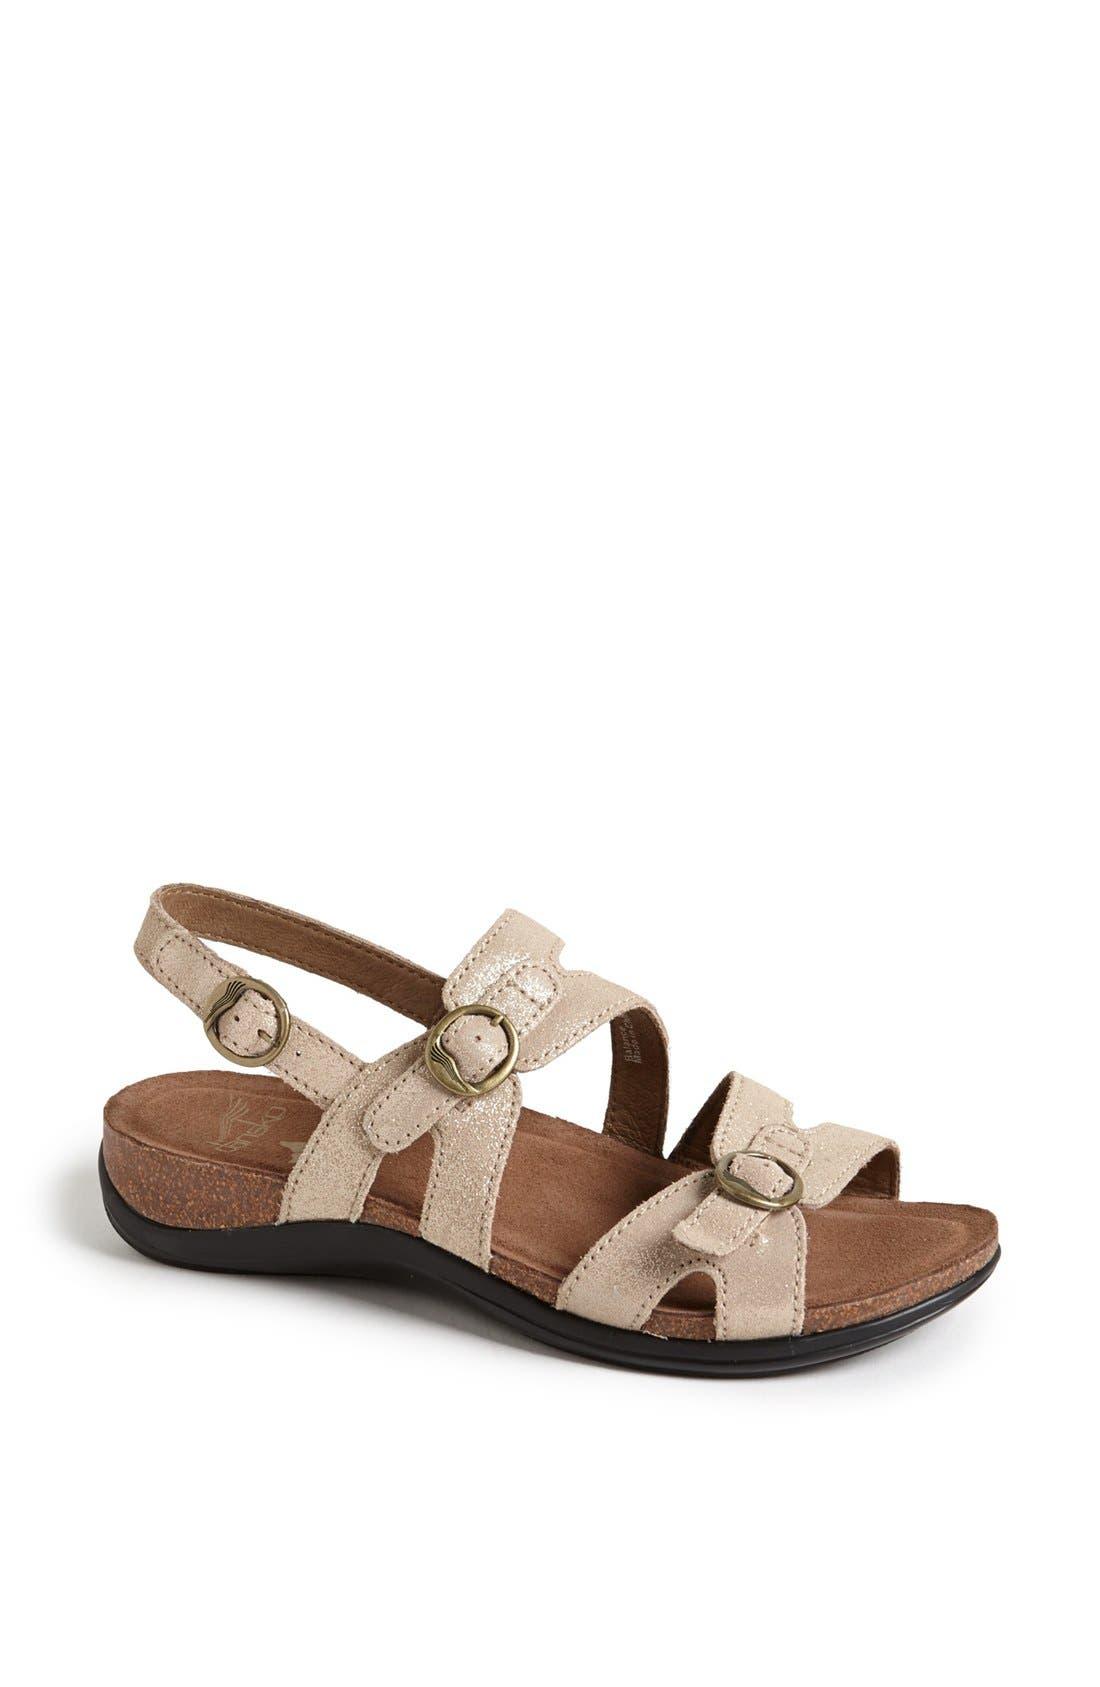 Alternate Image 1 Selected - Dansko 'Jameson' Leather Sandal